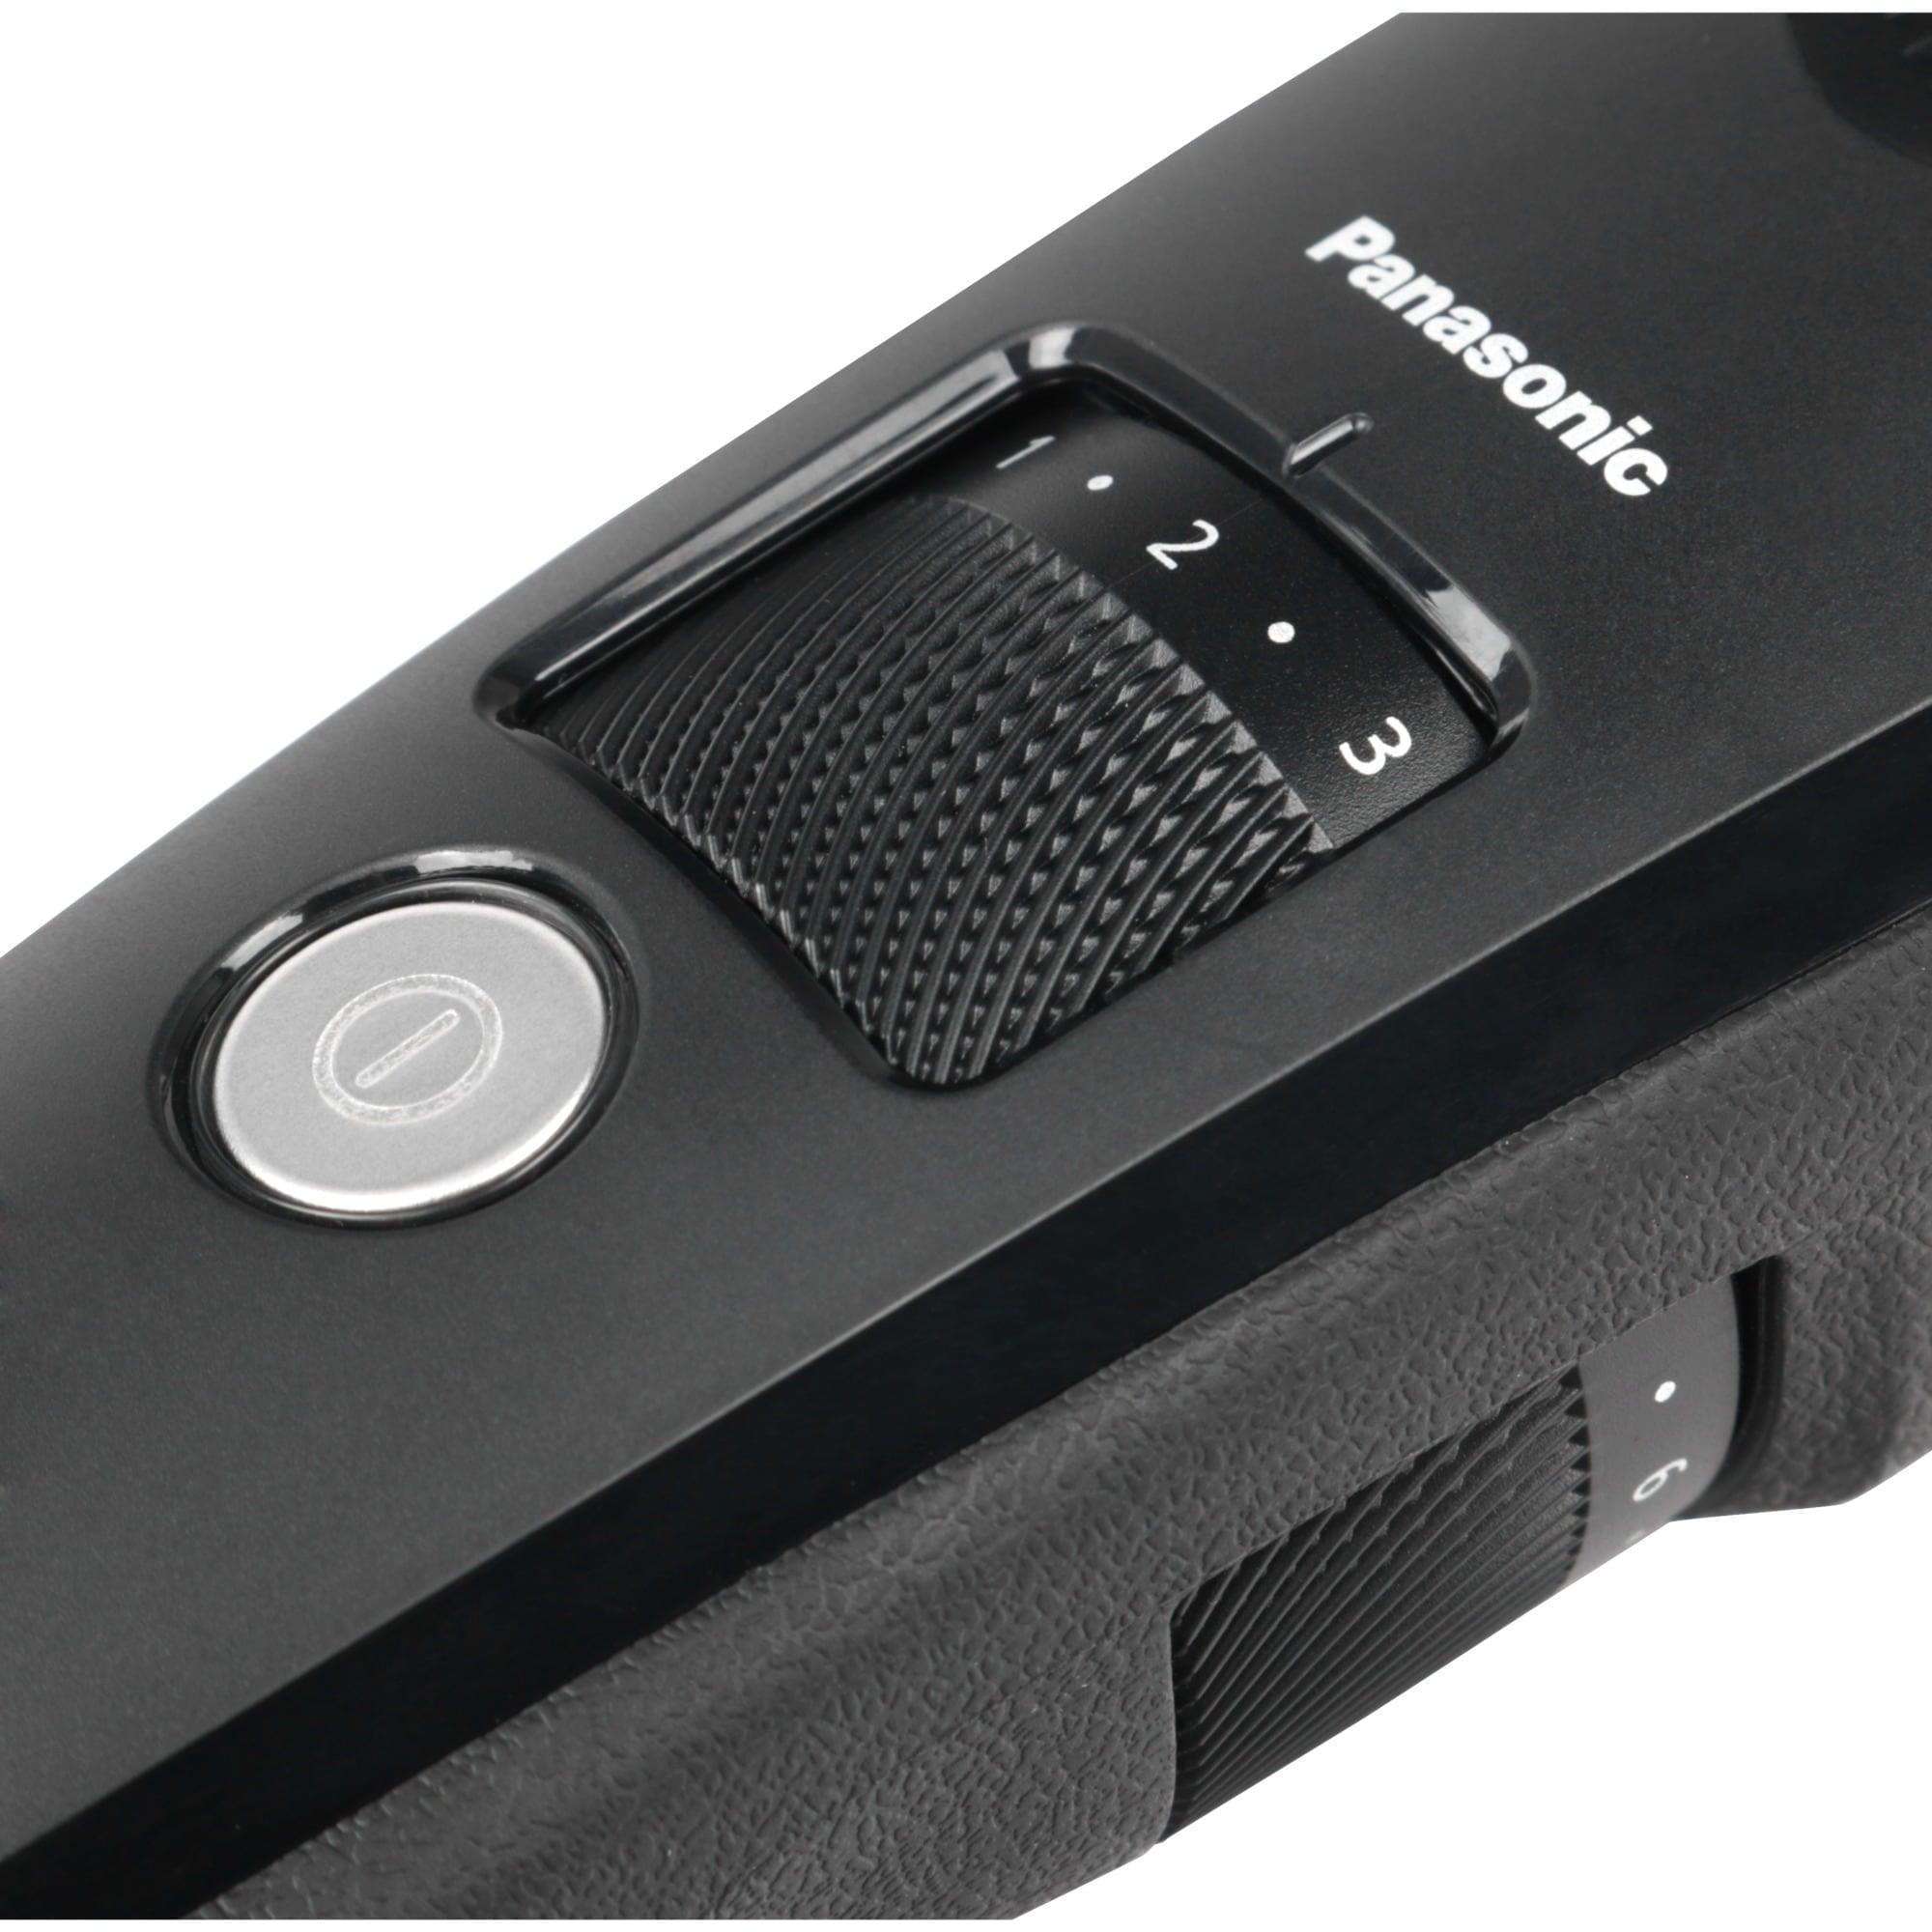 Panasonic Bartschneider ER-SB40-K803